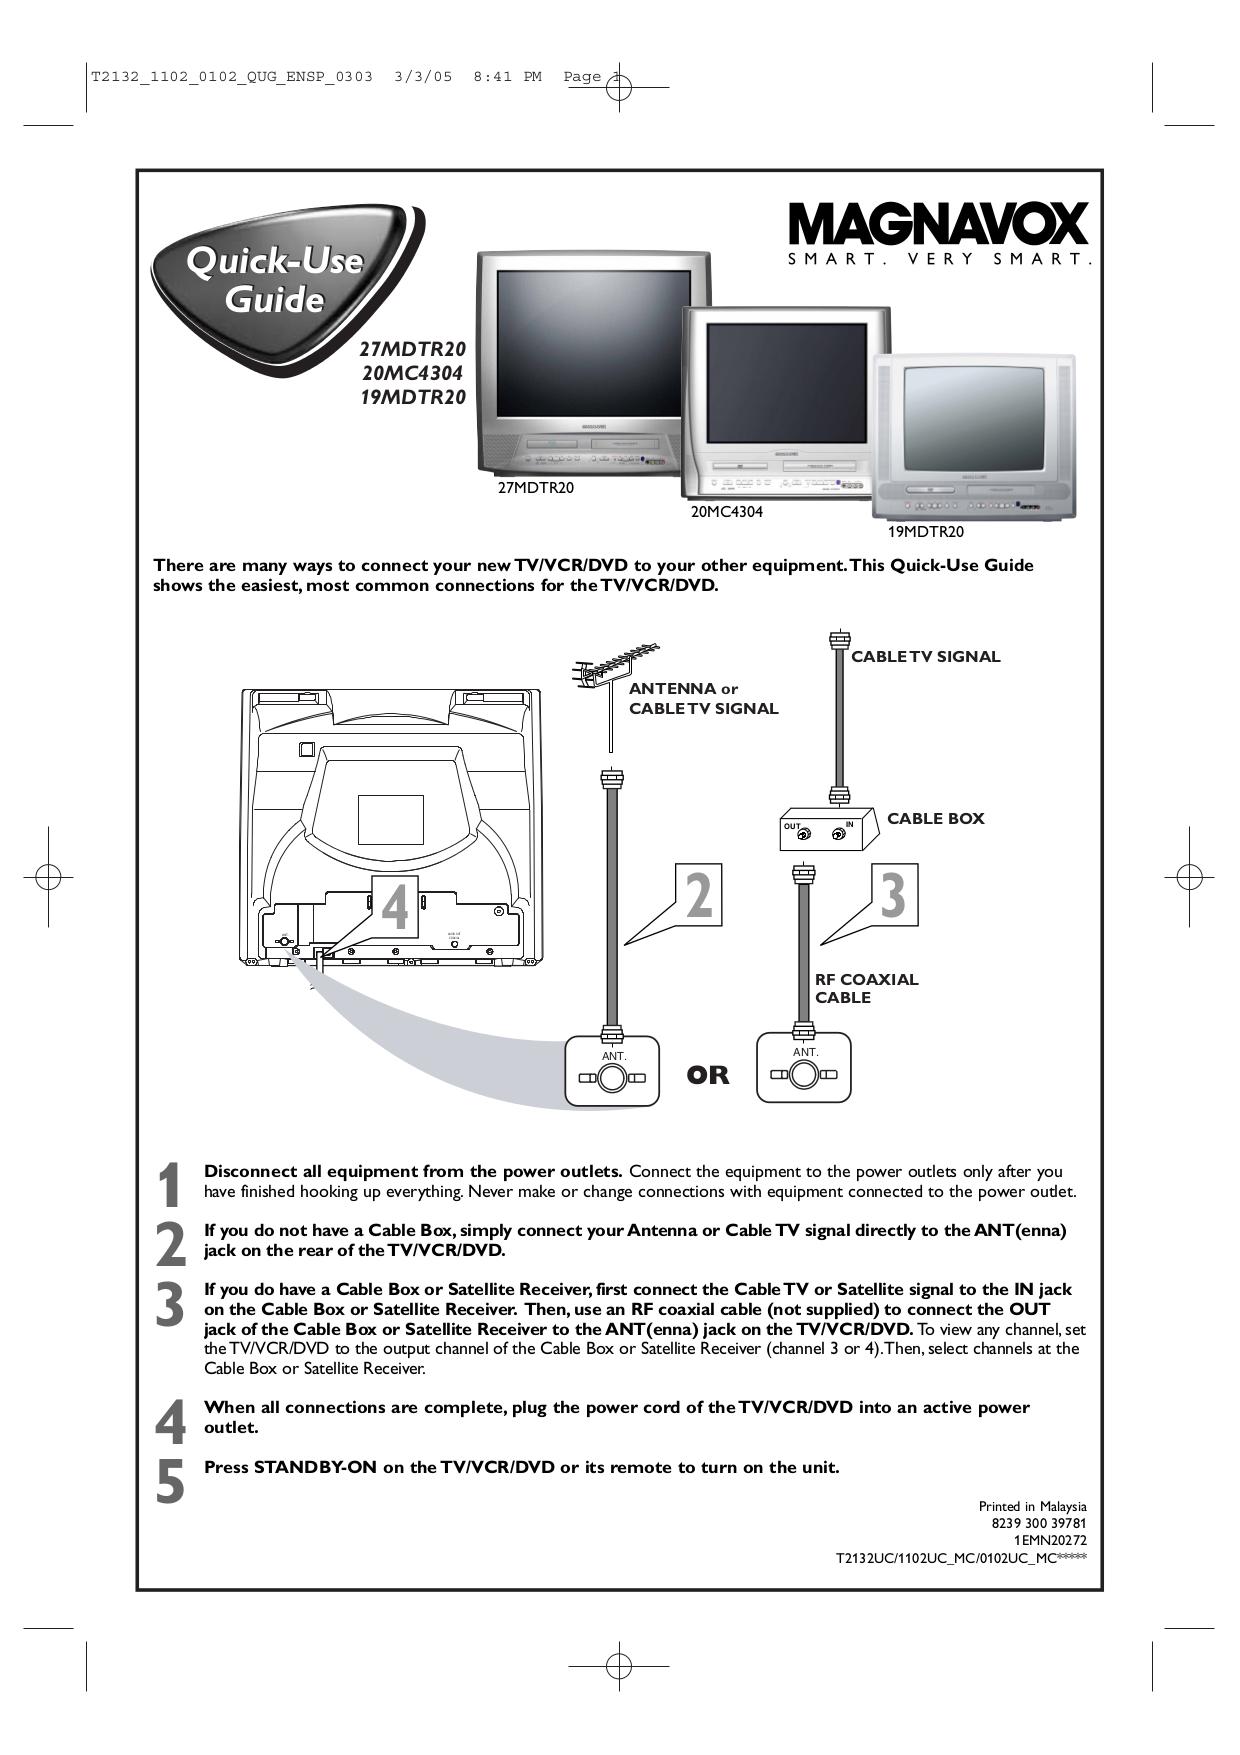 download free pdf for philips 19mdtr20 tv manual rh umlib com Magnavox VCR DVD Player Manual magnavox tv dvd player manual